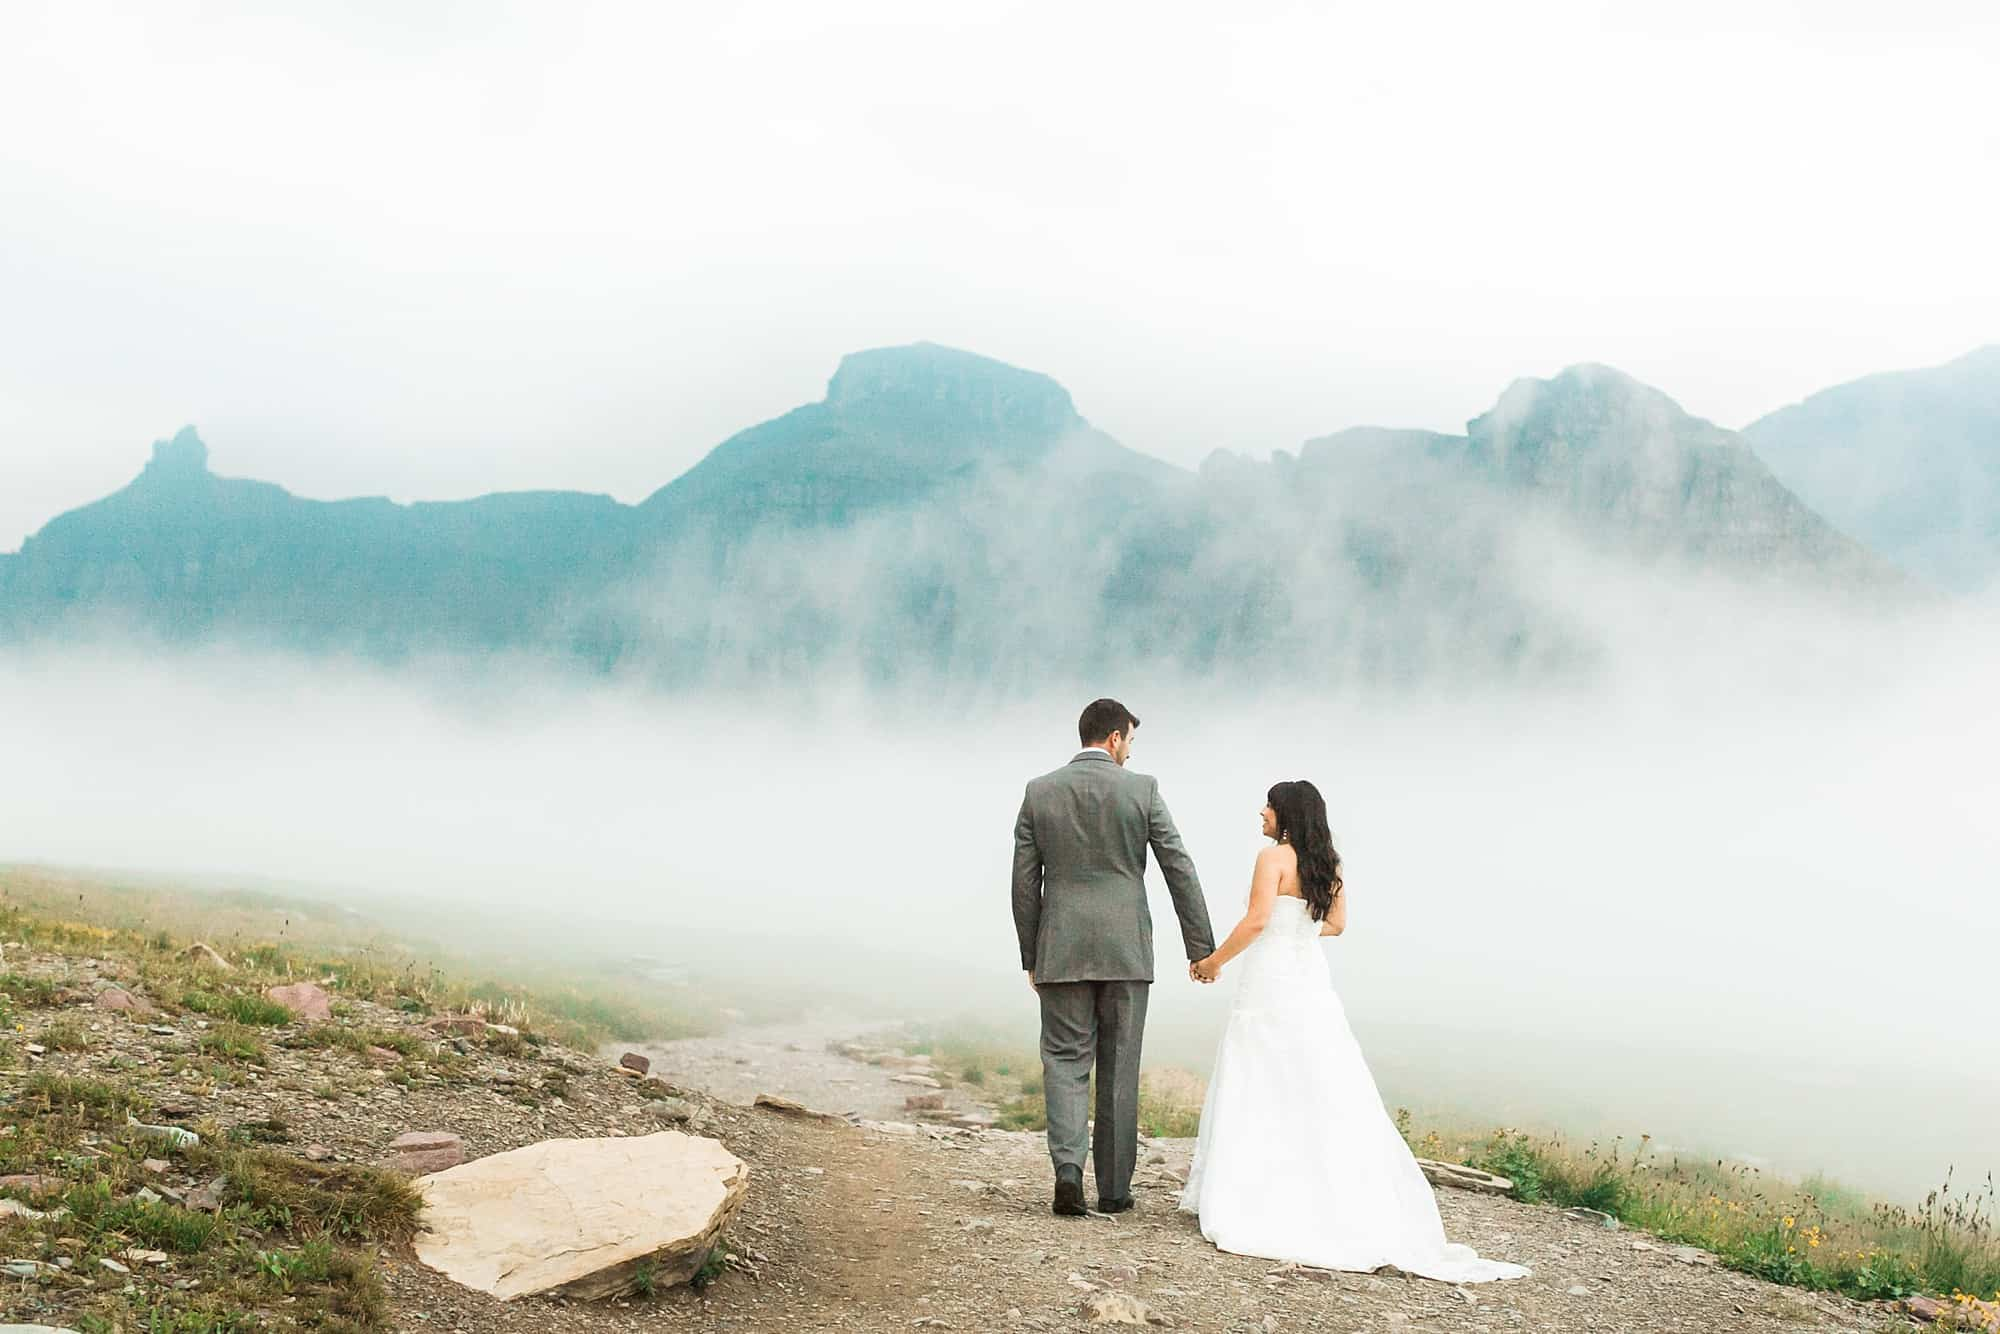 Destination Wedding | Dress and Packing Tips - Designer